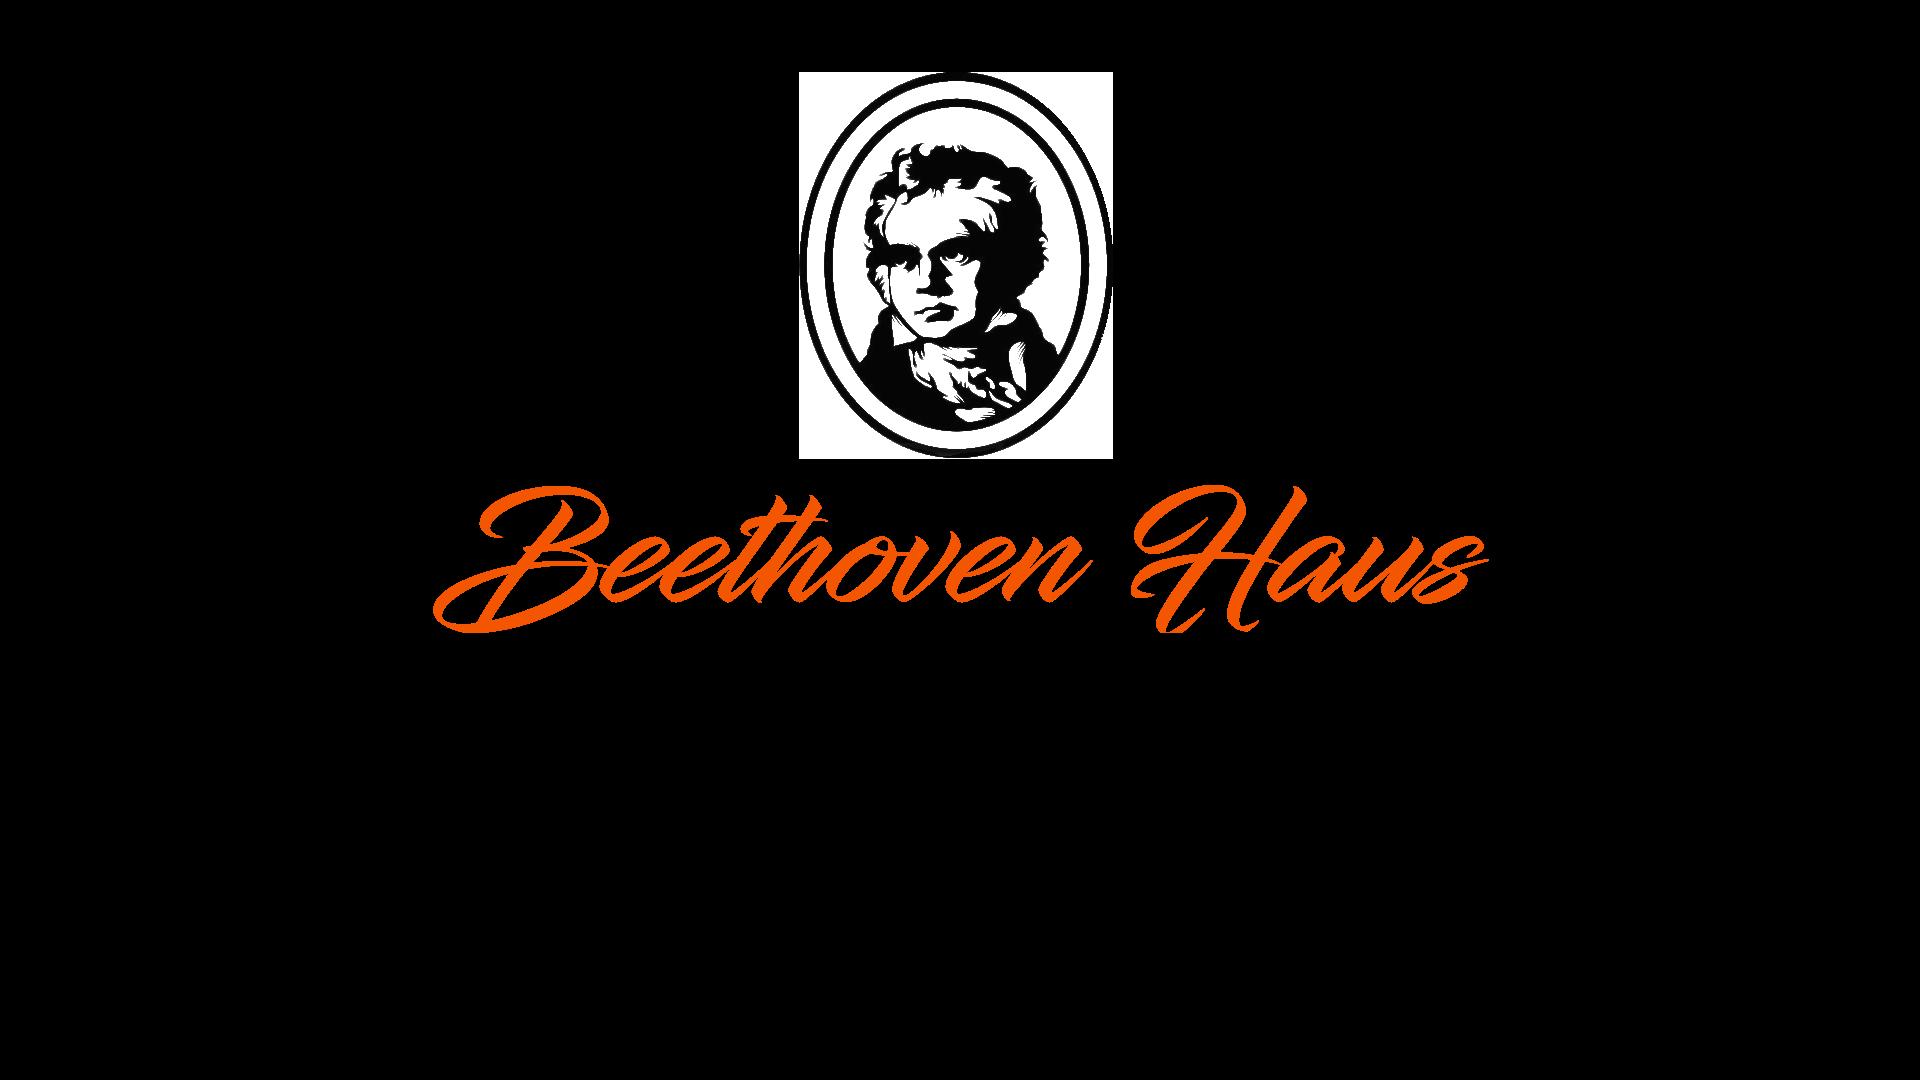 Beethoven Haus Escola de Música e Artes